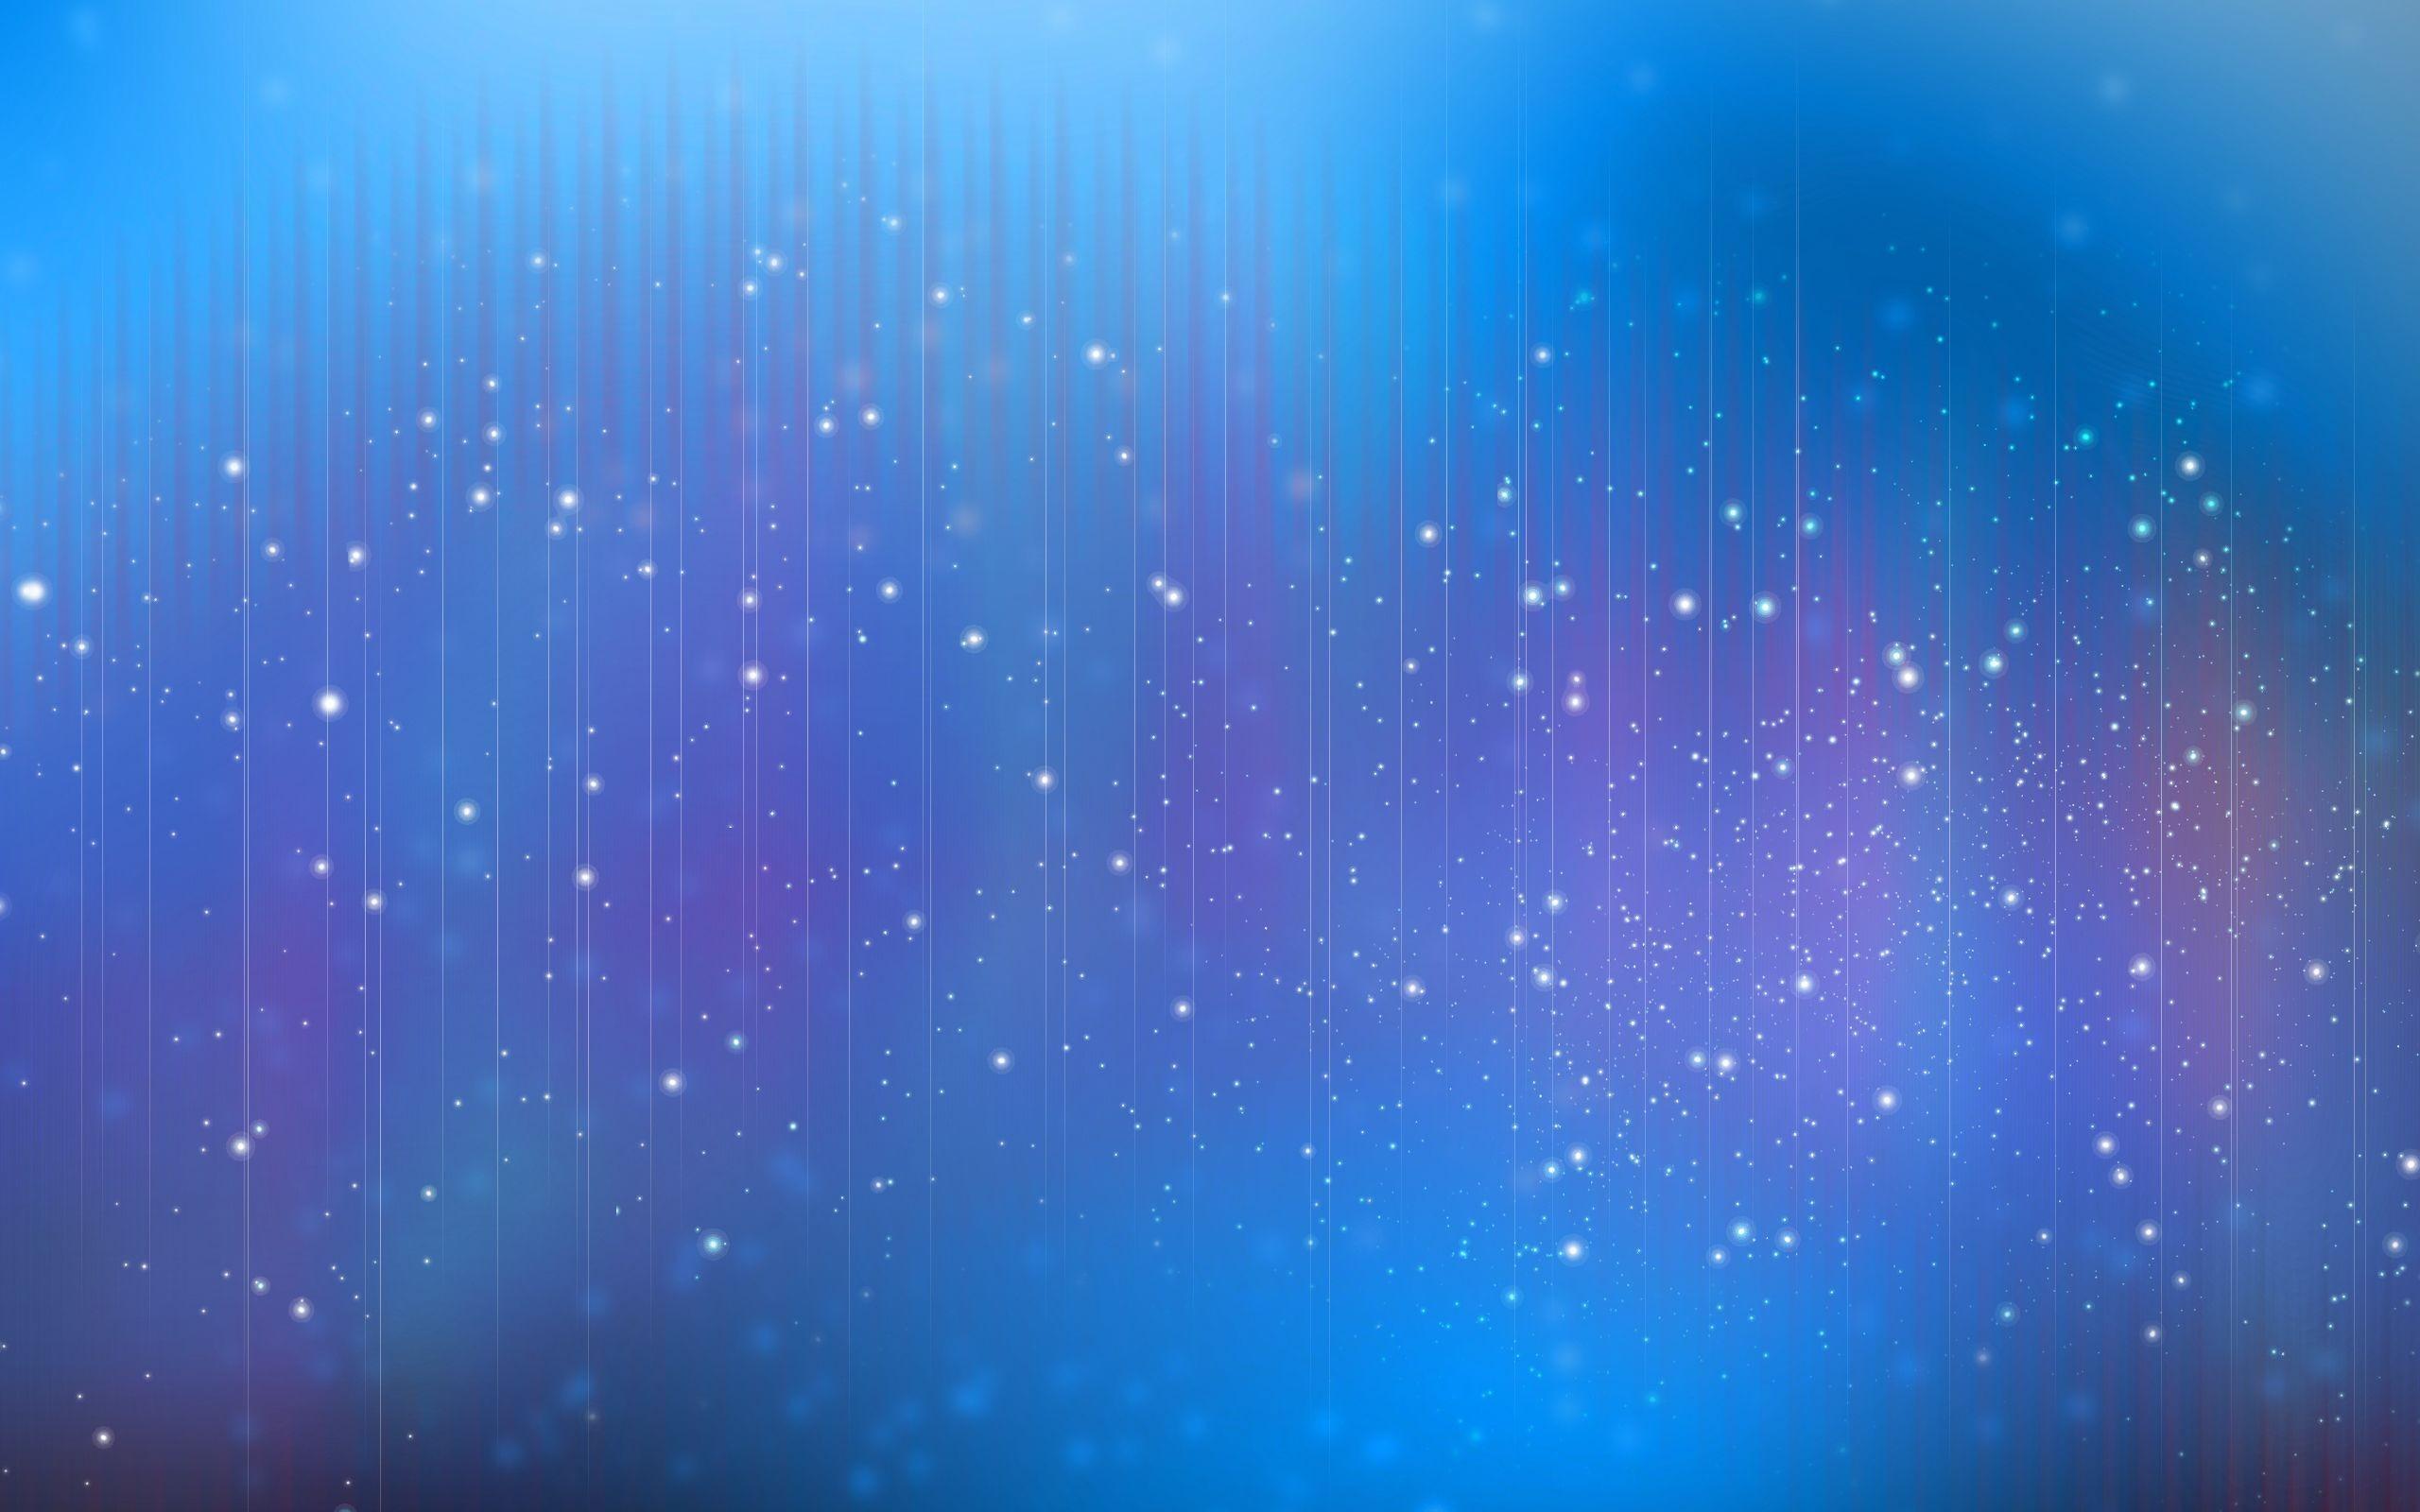 Light Blue Violet Color Abstract Wallpaper